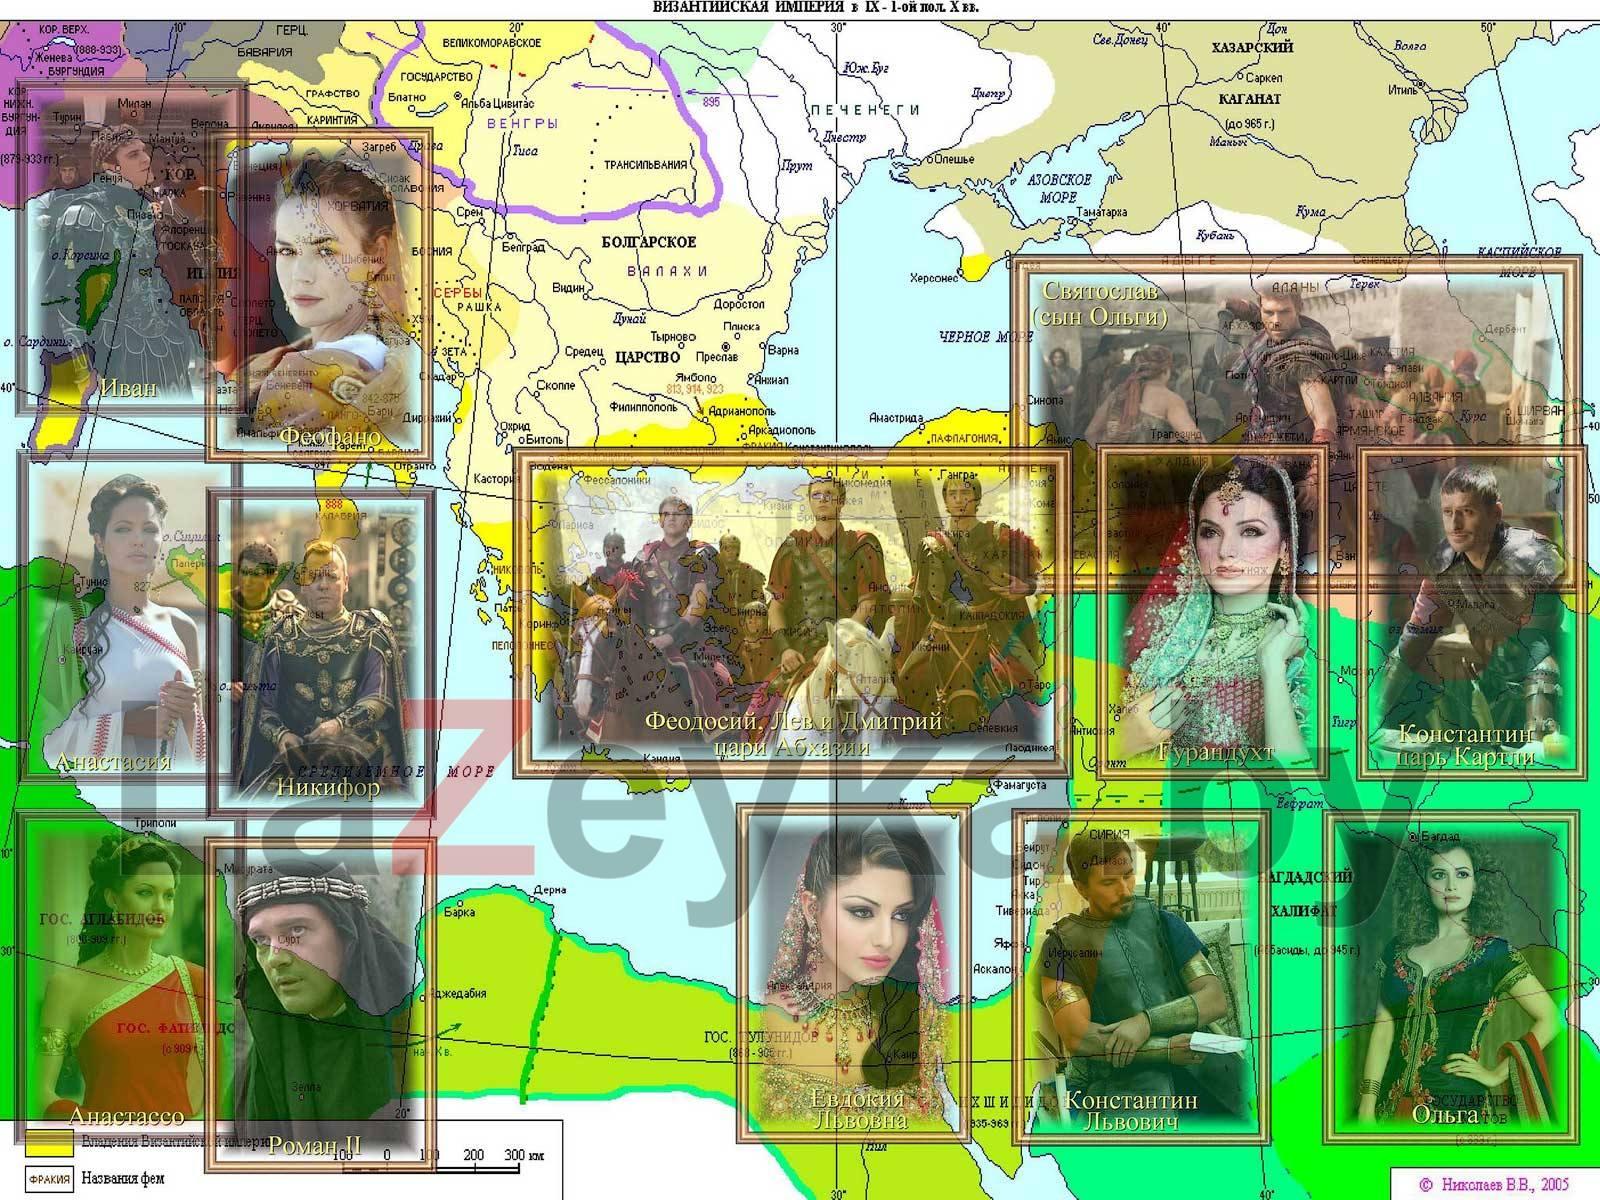 Ситуация в регионе на момент смерти Константина Багрянородного.